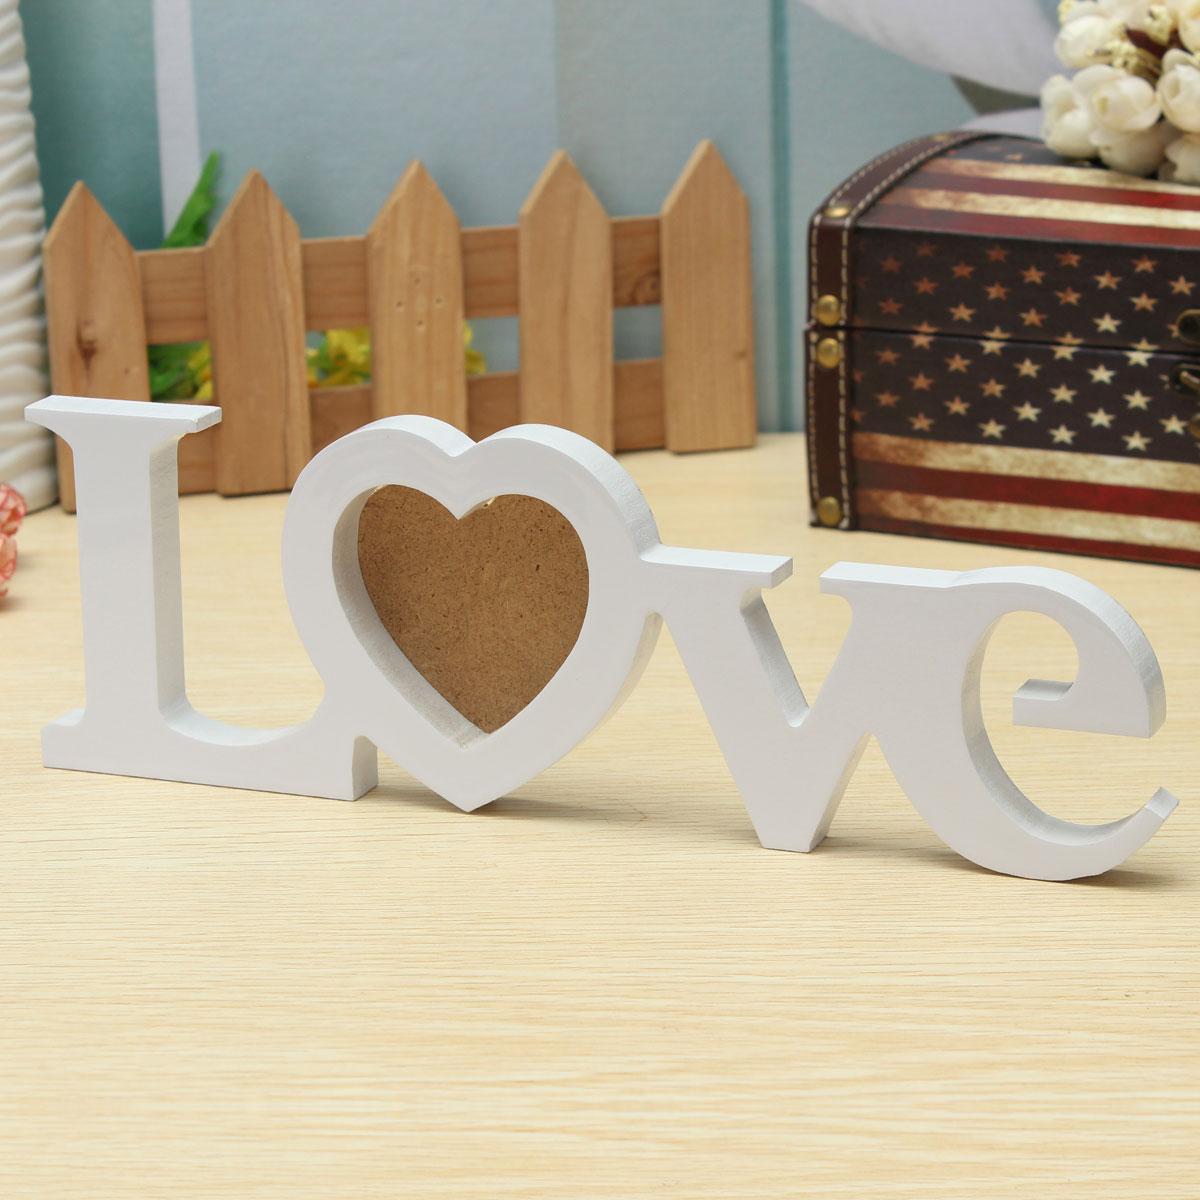 ... Frame DIY Wedding Gift Home Room Table Decor White Lazada Malaysia